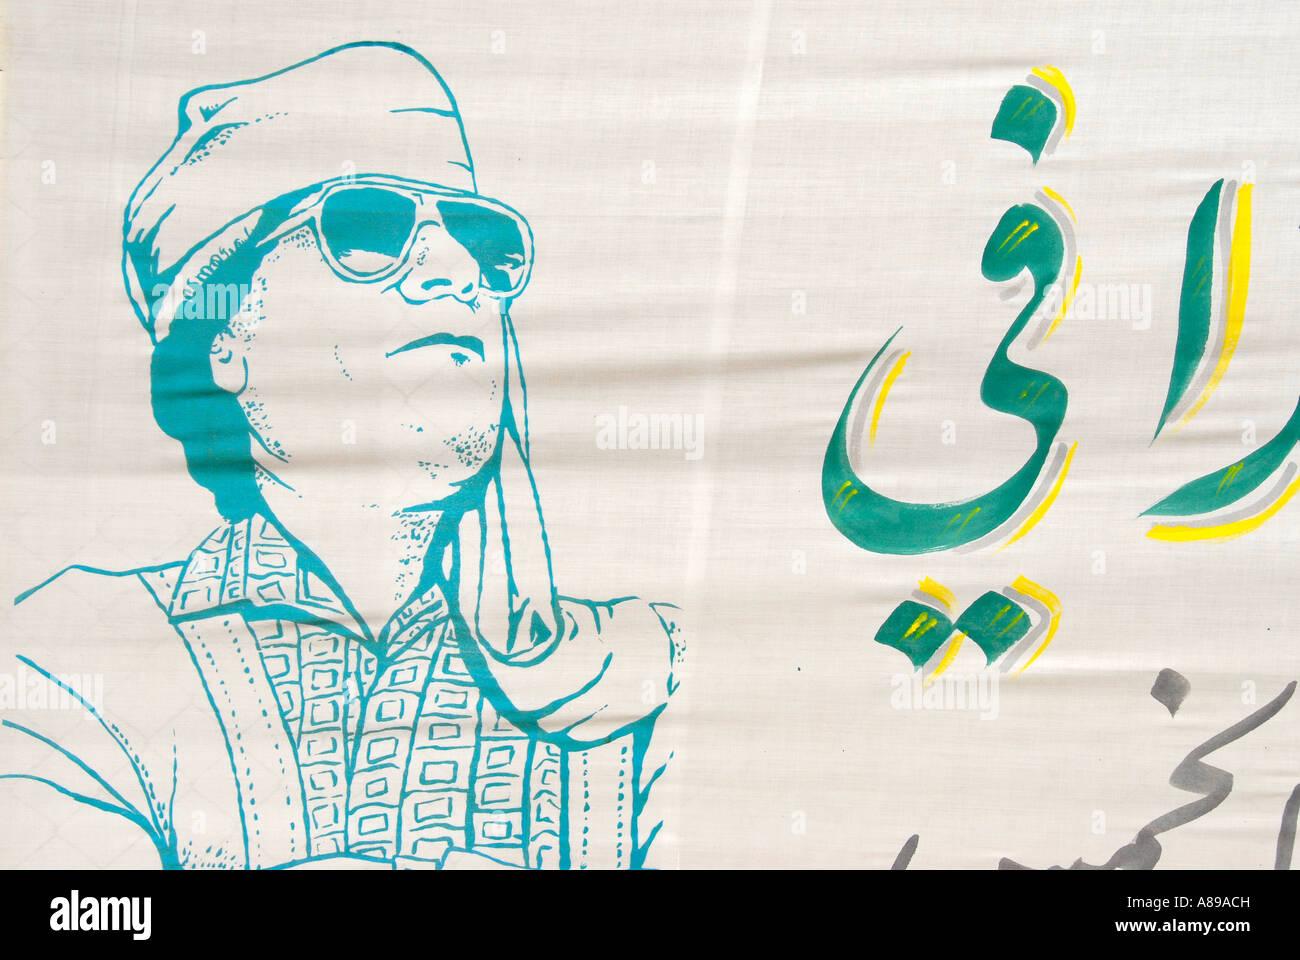 Print on cloth of the head of state Muammar al Gaddafi Libya - Stock Image